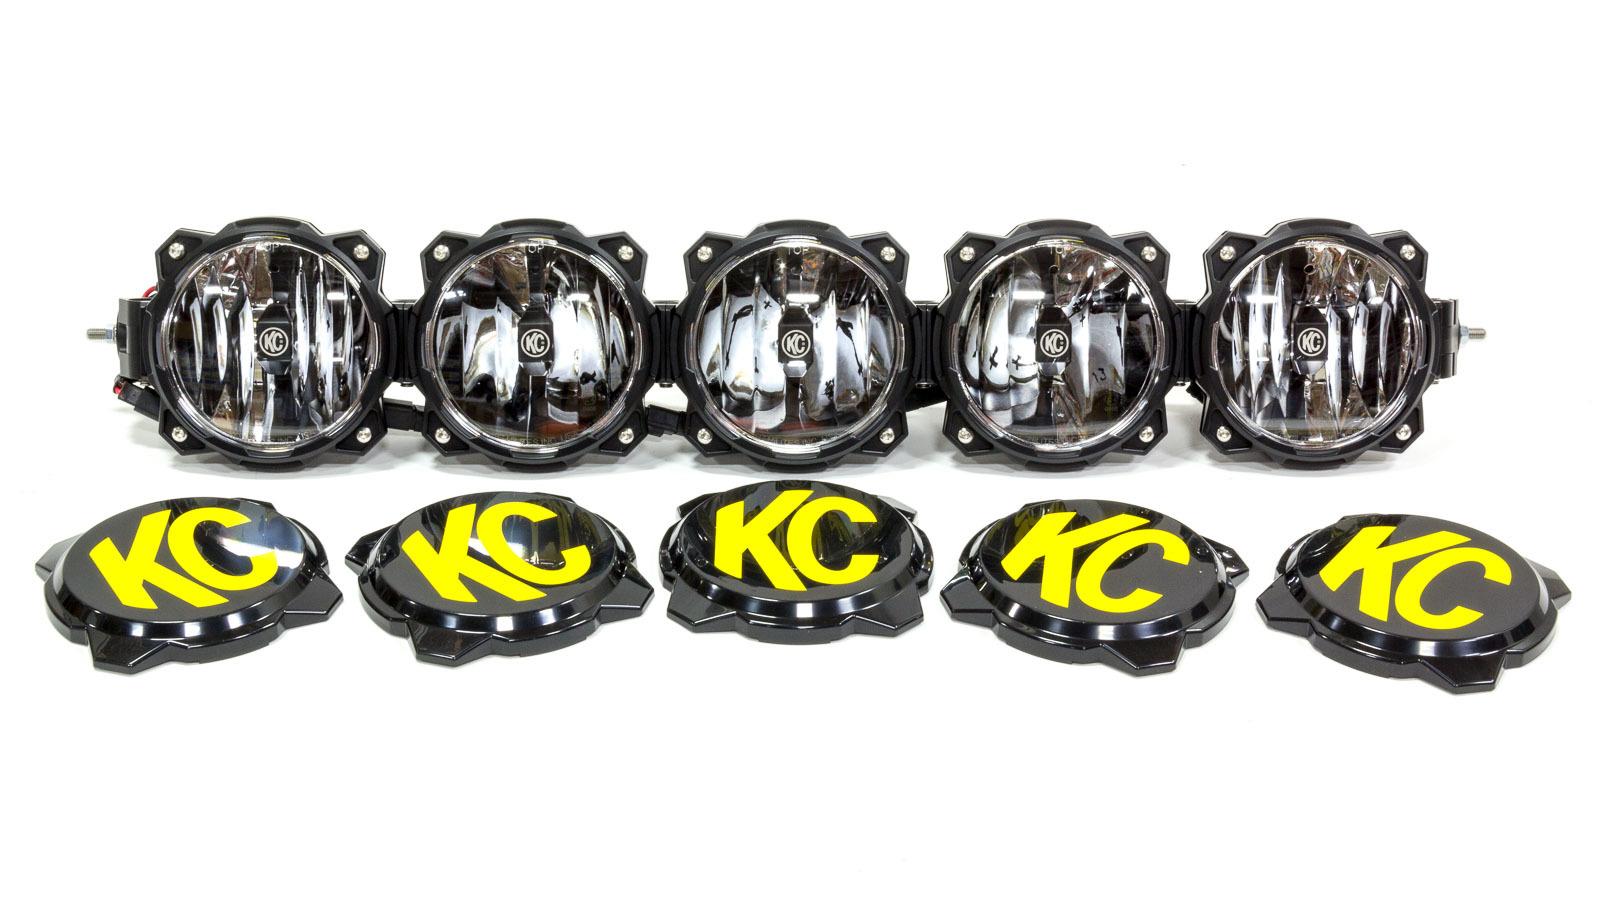 Kc Hilites Pro6 Gravity LED Light Bar 5 Light 32in